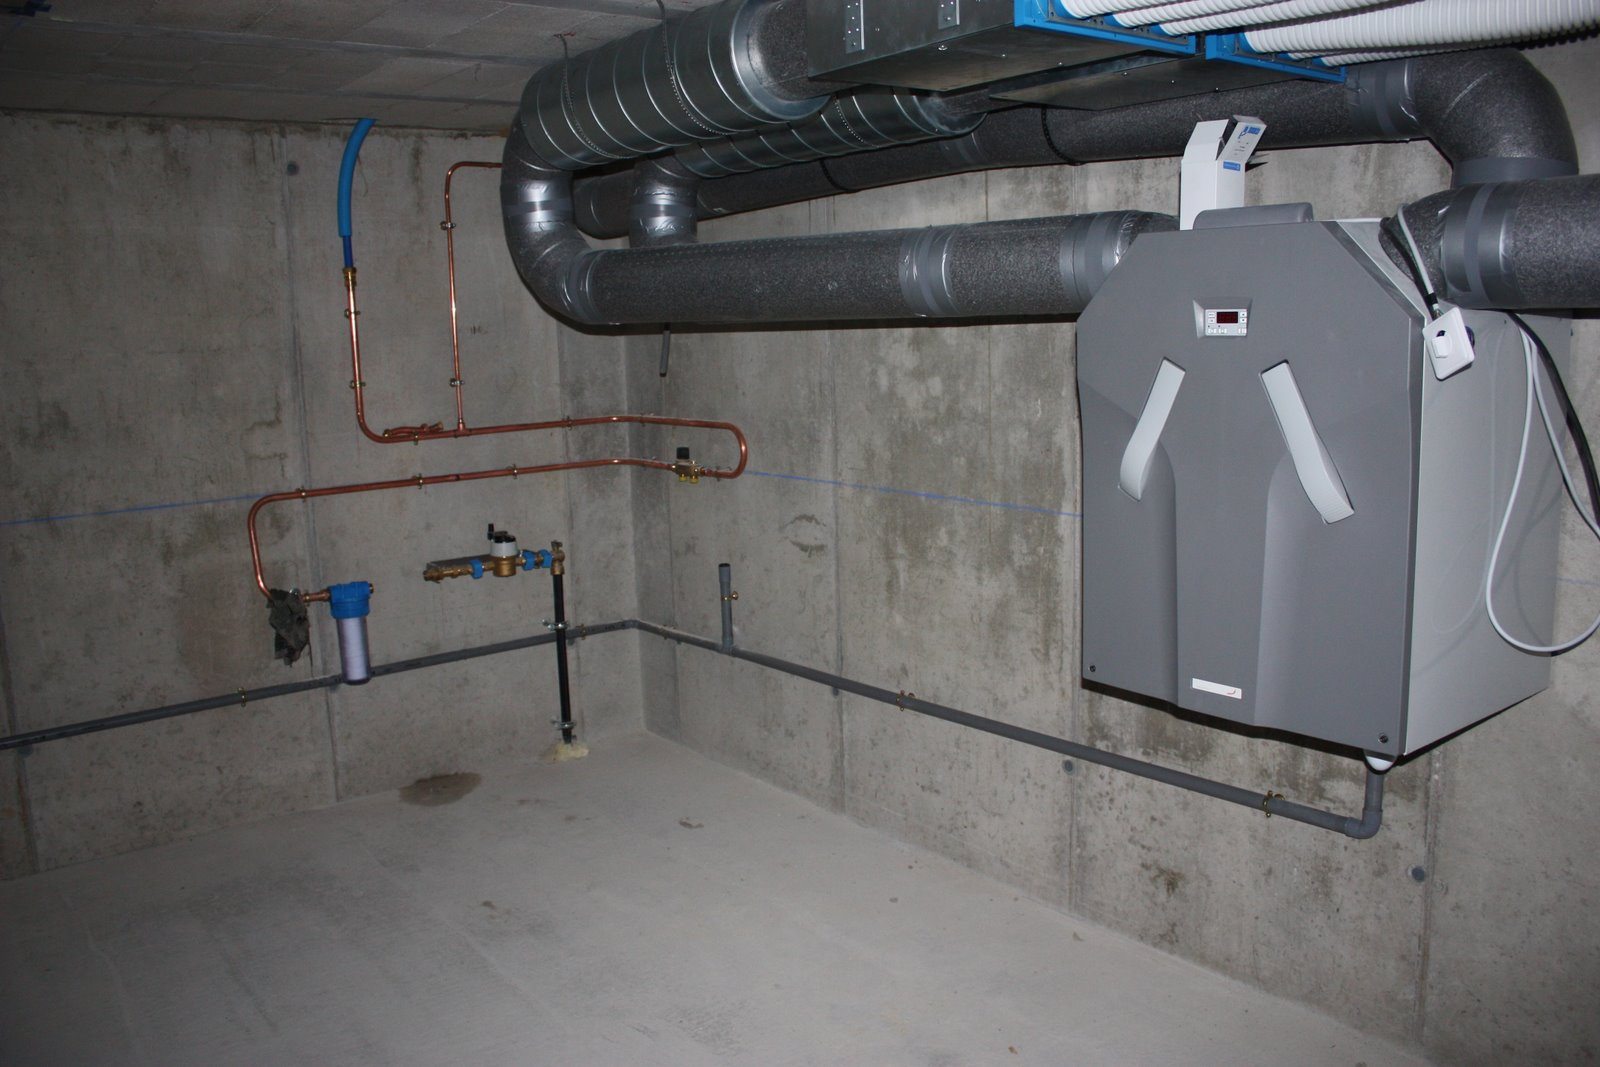 mob ossature bois isolation energie domotique bbc knx alsace octobre 2010. Black Bedroom Furniture Sets. Home Design Ideas